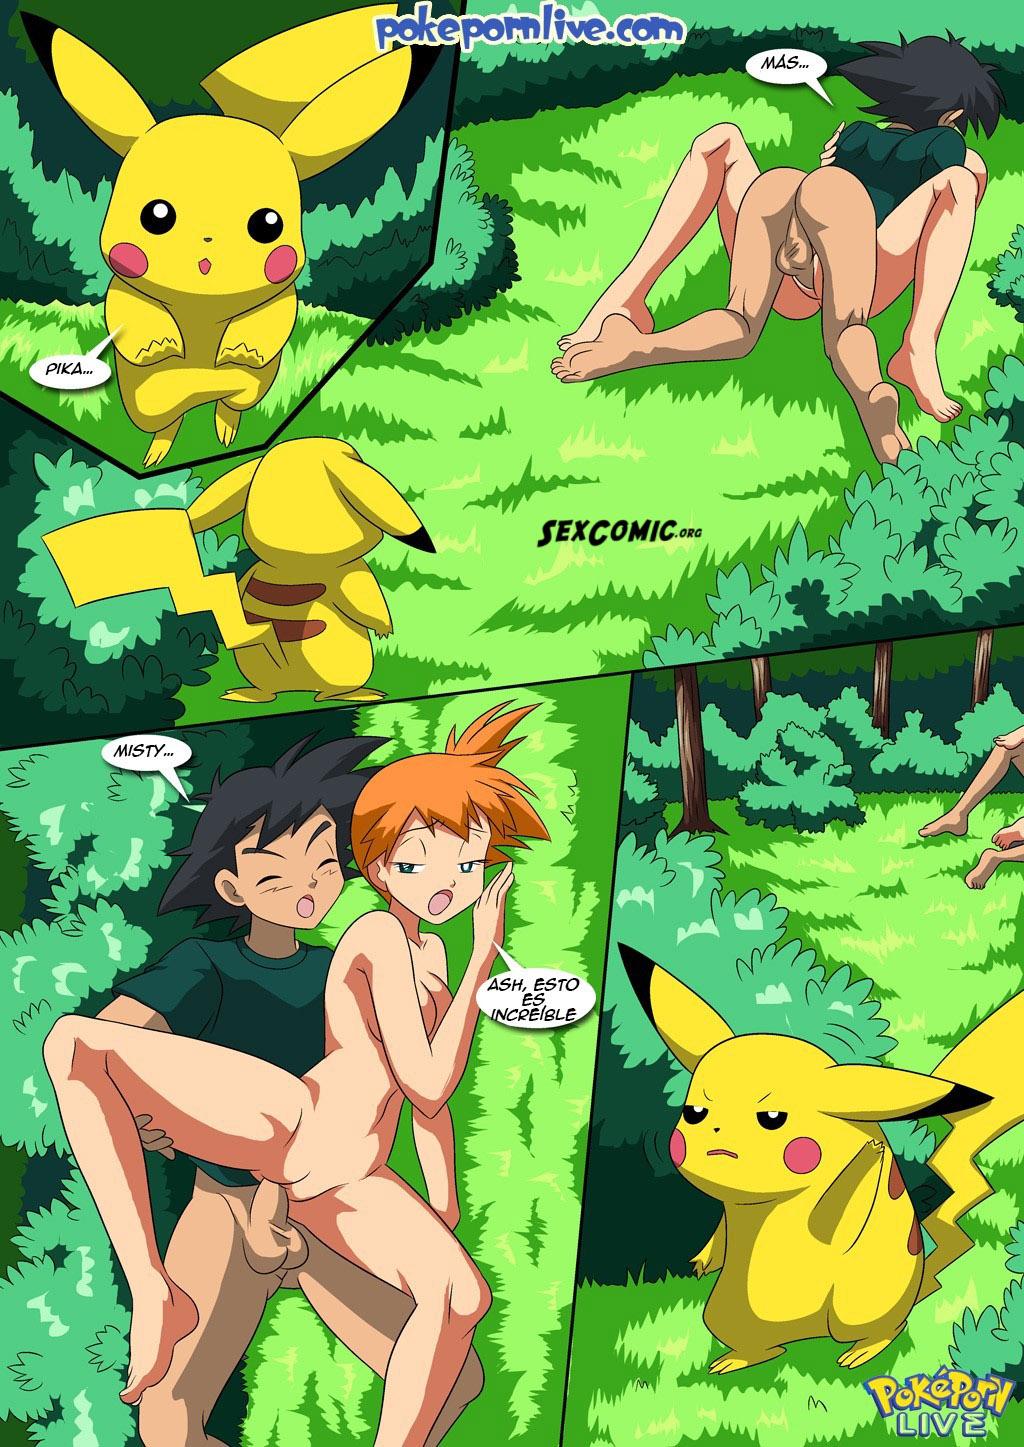 french nudists net